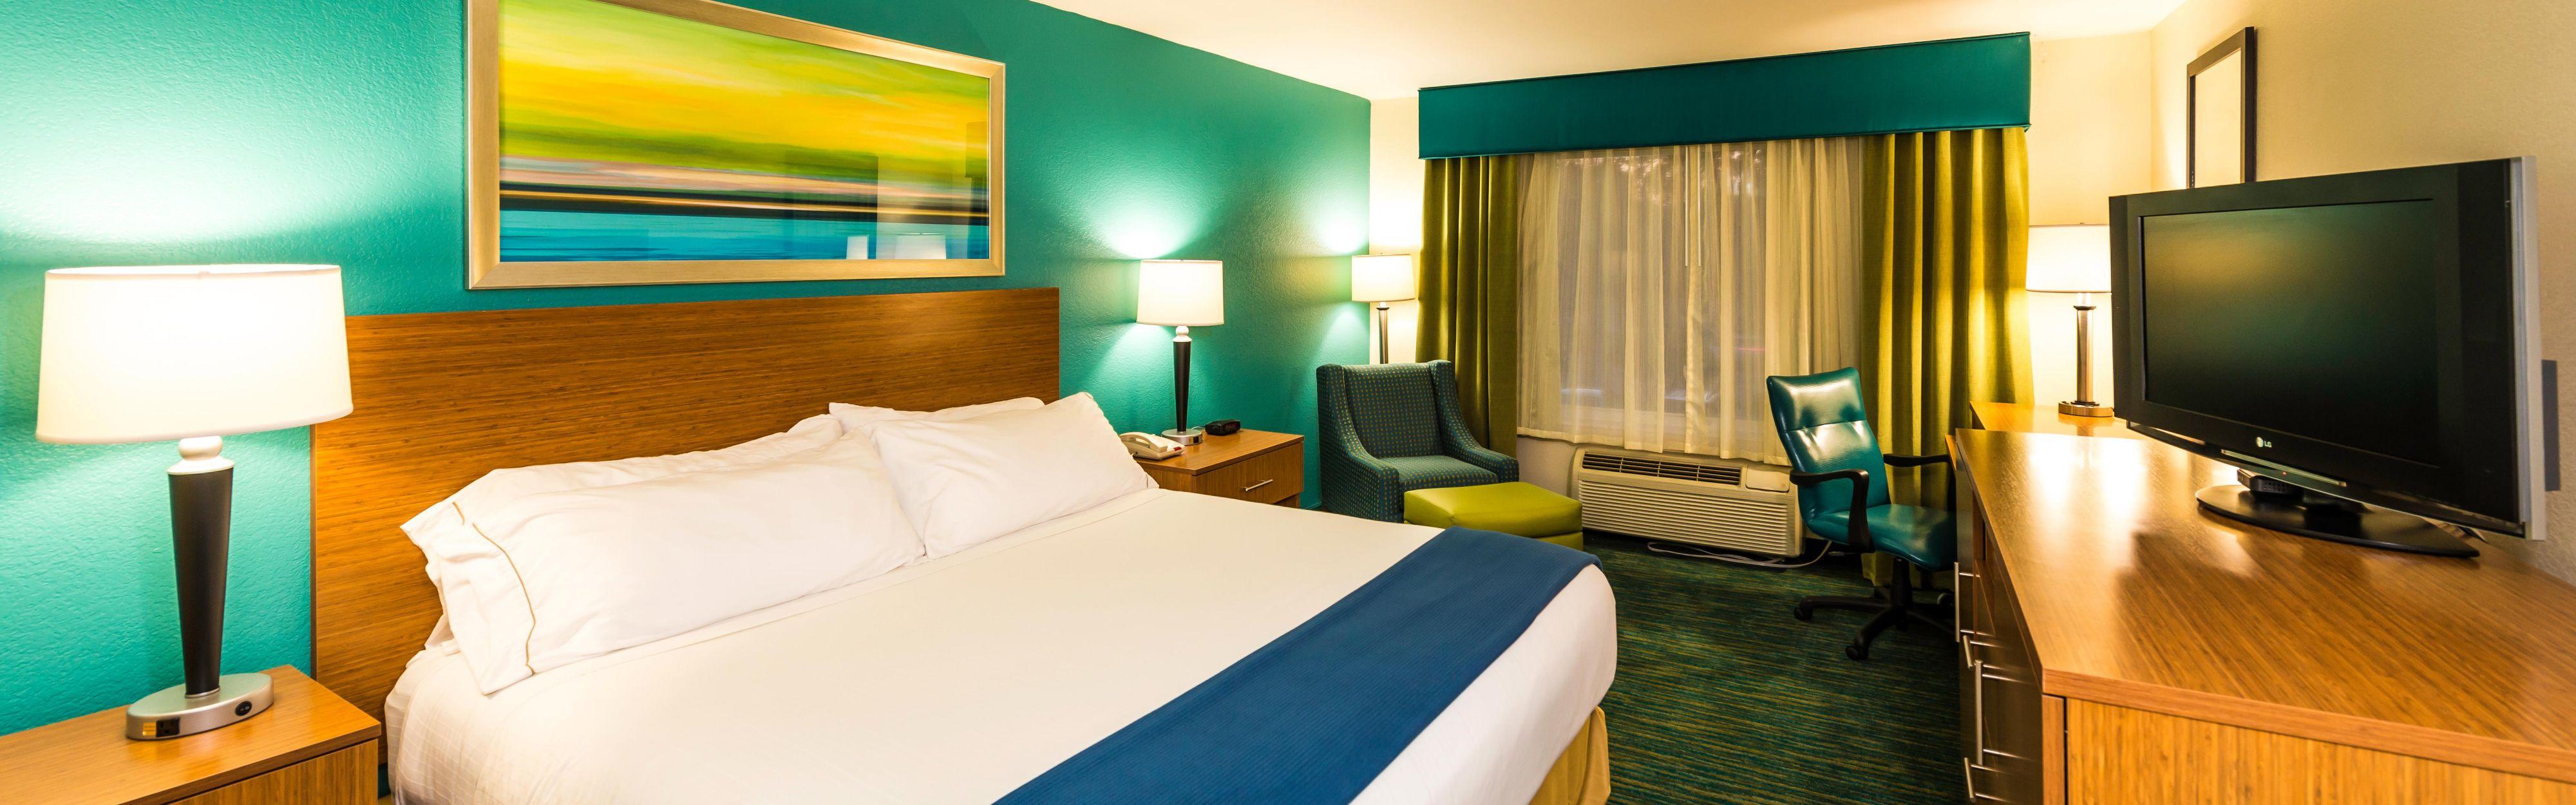 Holiday Inn Express & Suites Jacksonville - Blount Island image 1